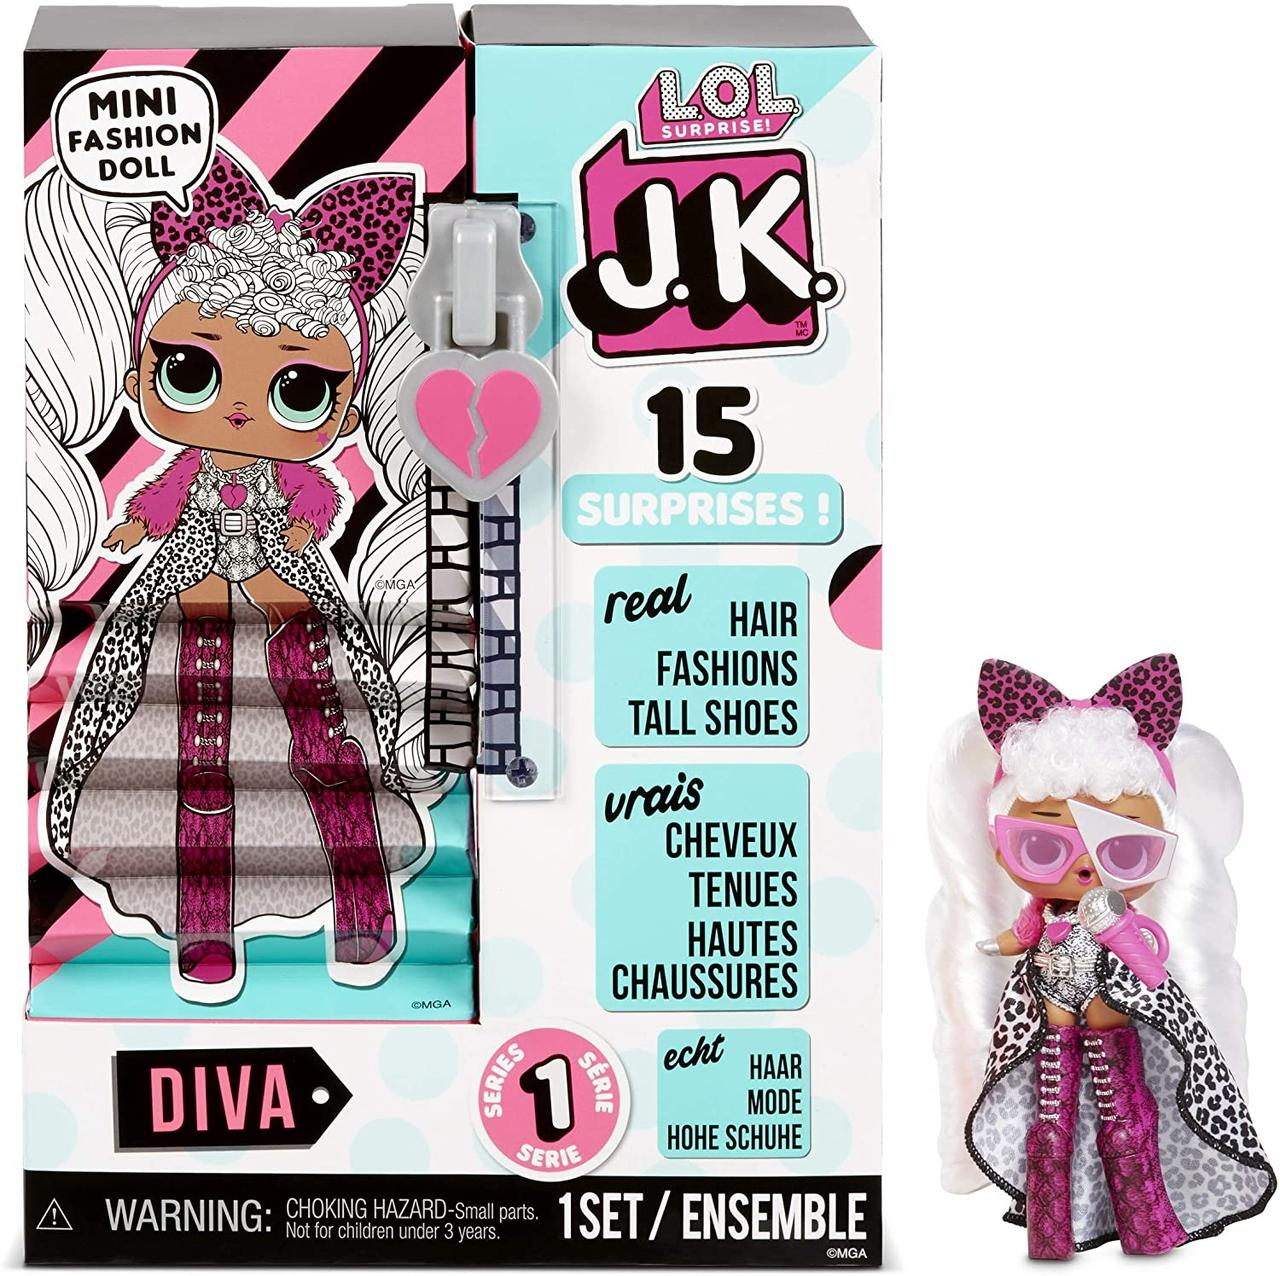 Кукла ЛОЛ леди Дива L.O.L. Surprise! JK Diva Mini Fashion Doll with 15 Surprises